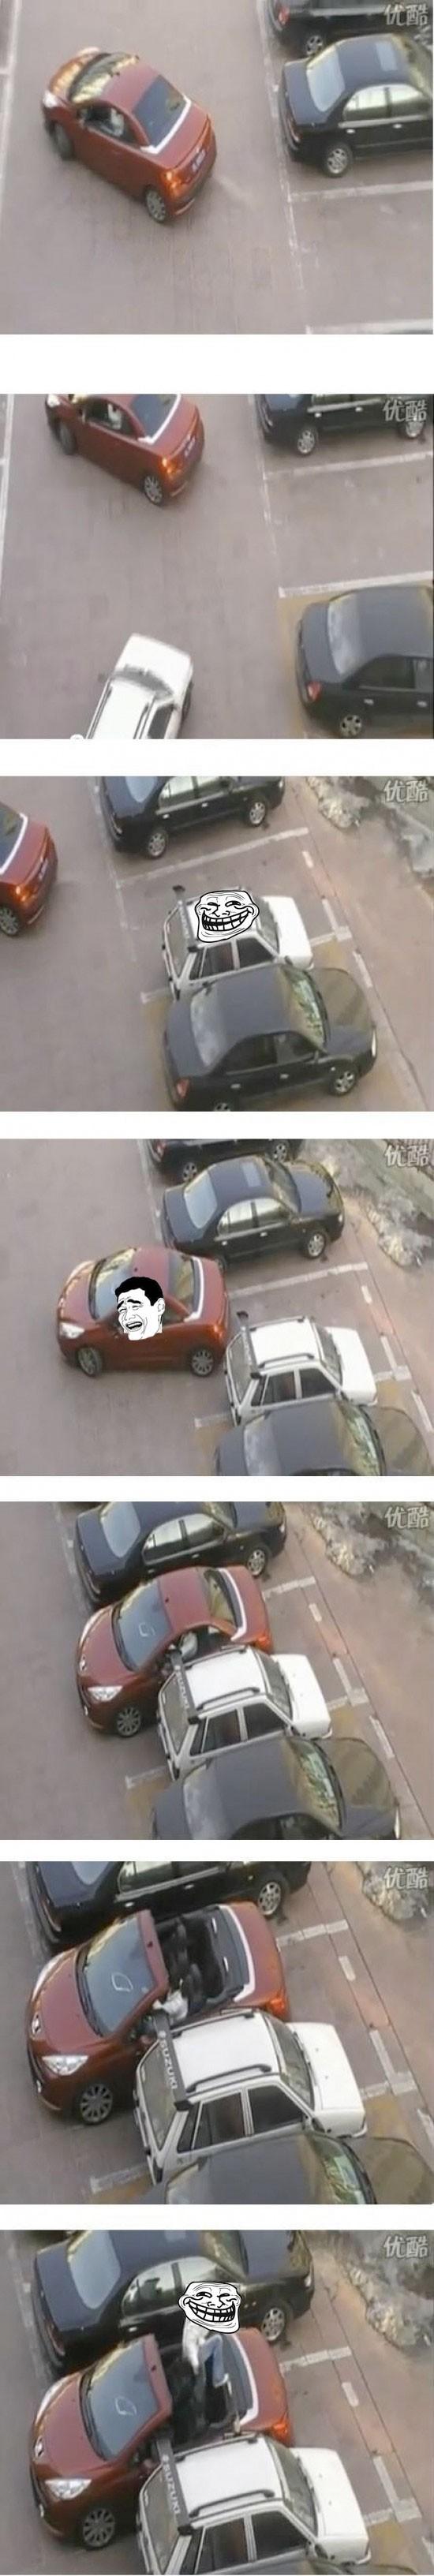 aparcamiento,coche,karma,troll